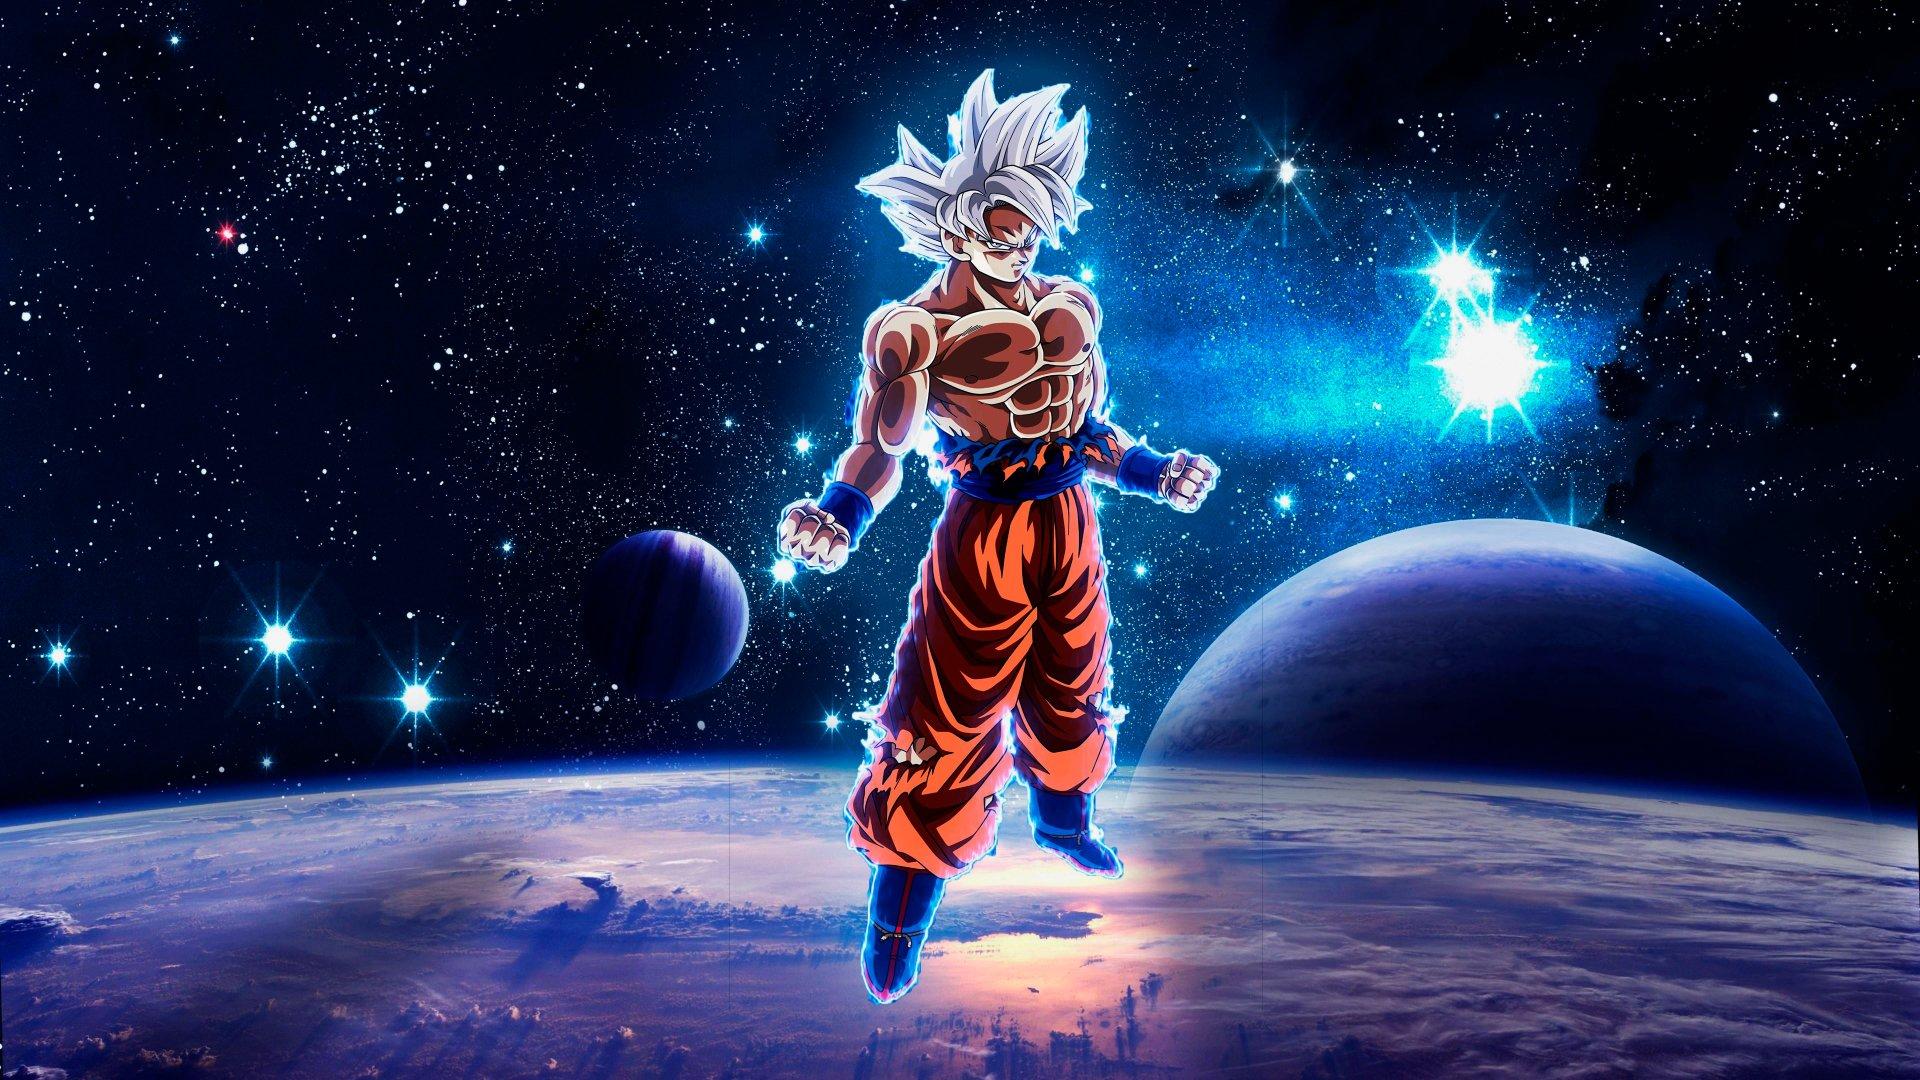 Goku Live Wallpaper Iphone 7 Plus Goku Ultra Instinct 4k Ultra Hd Wallpaper And Hintergrund